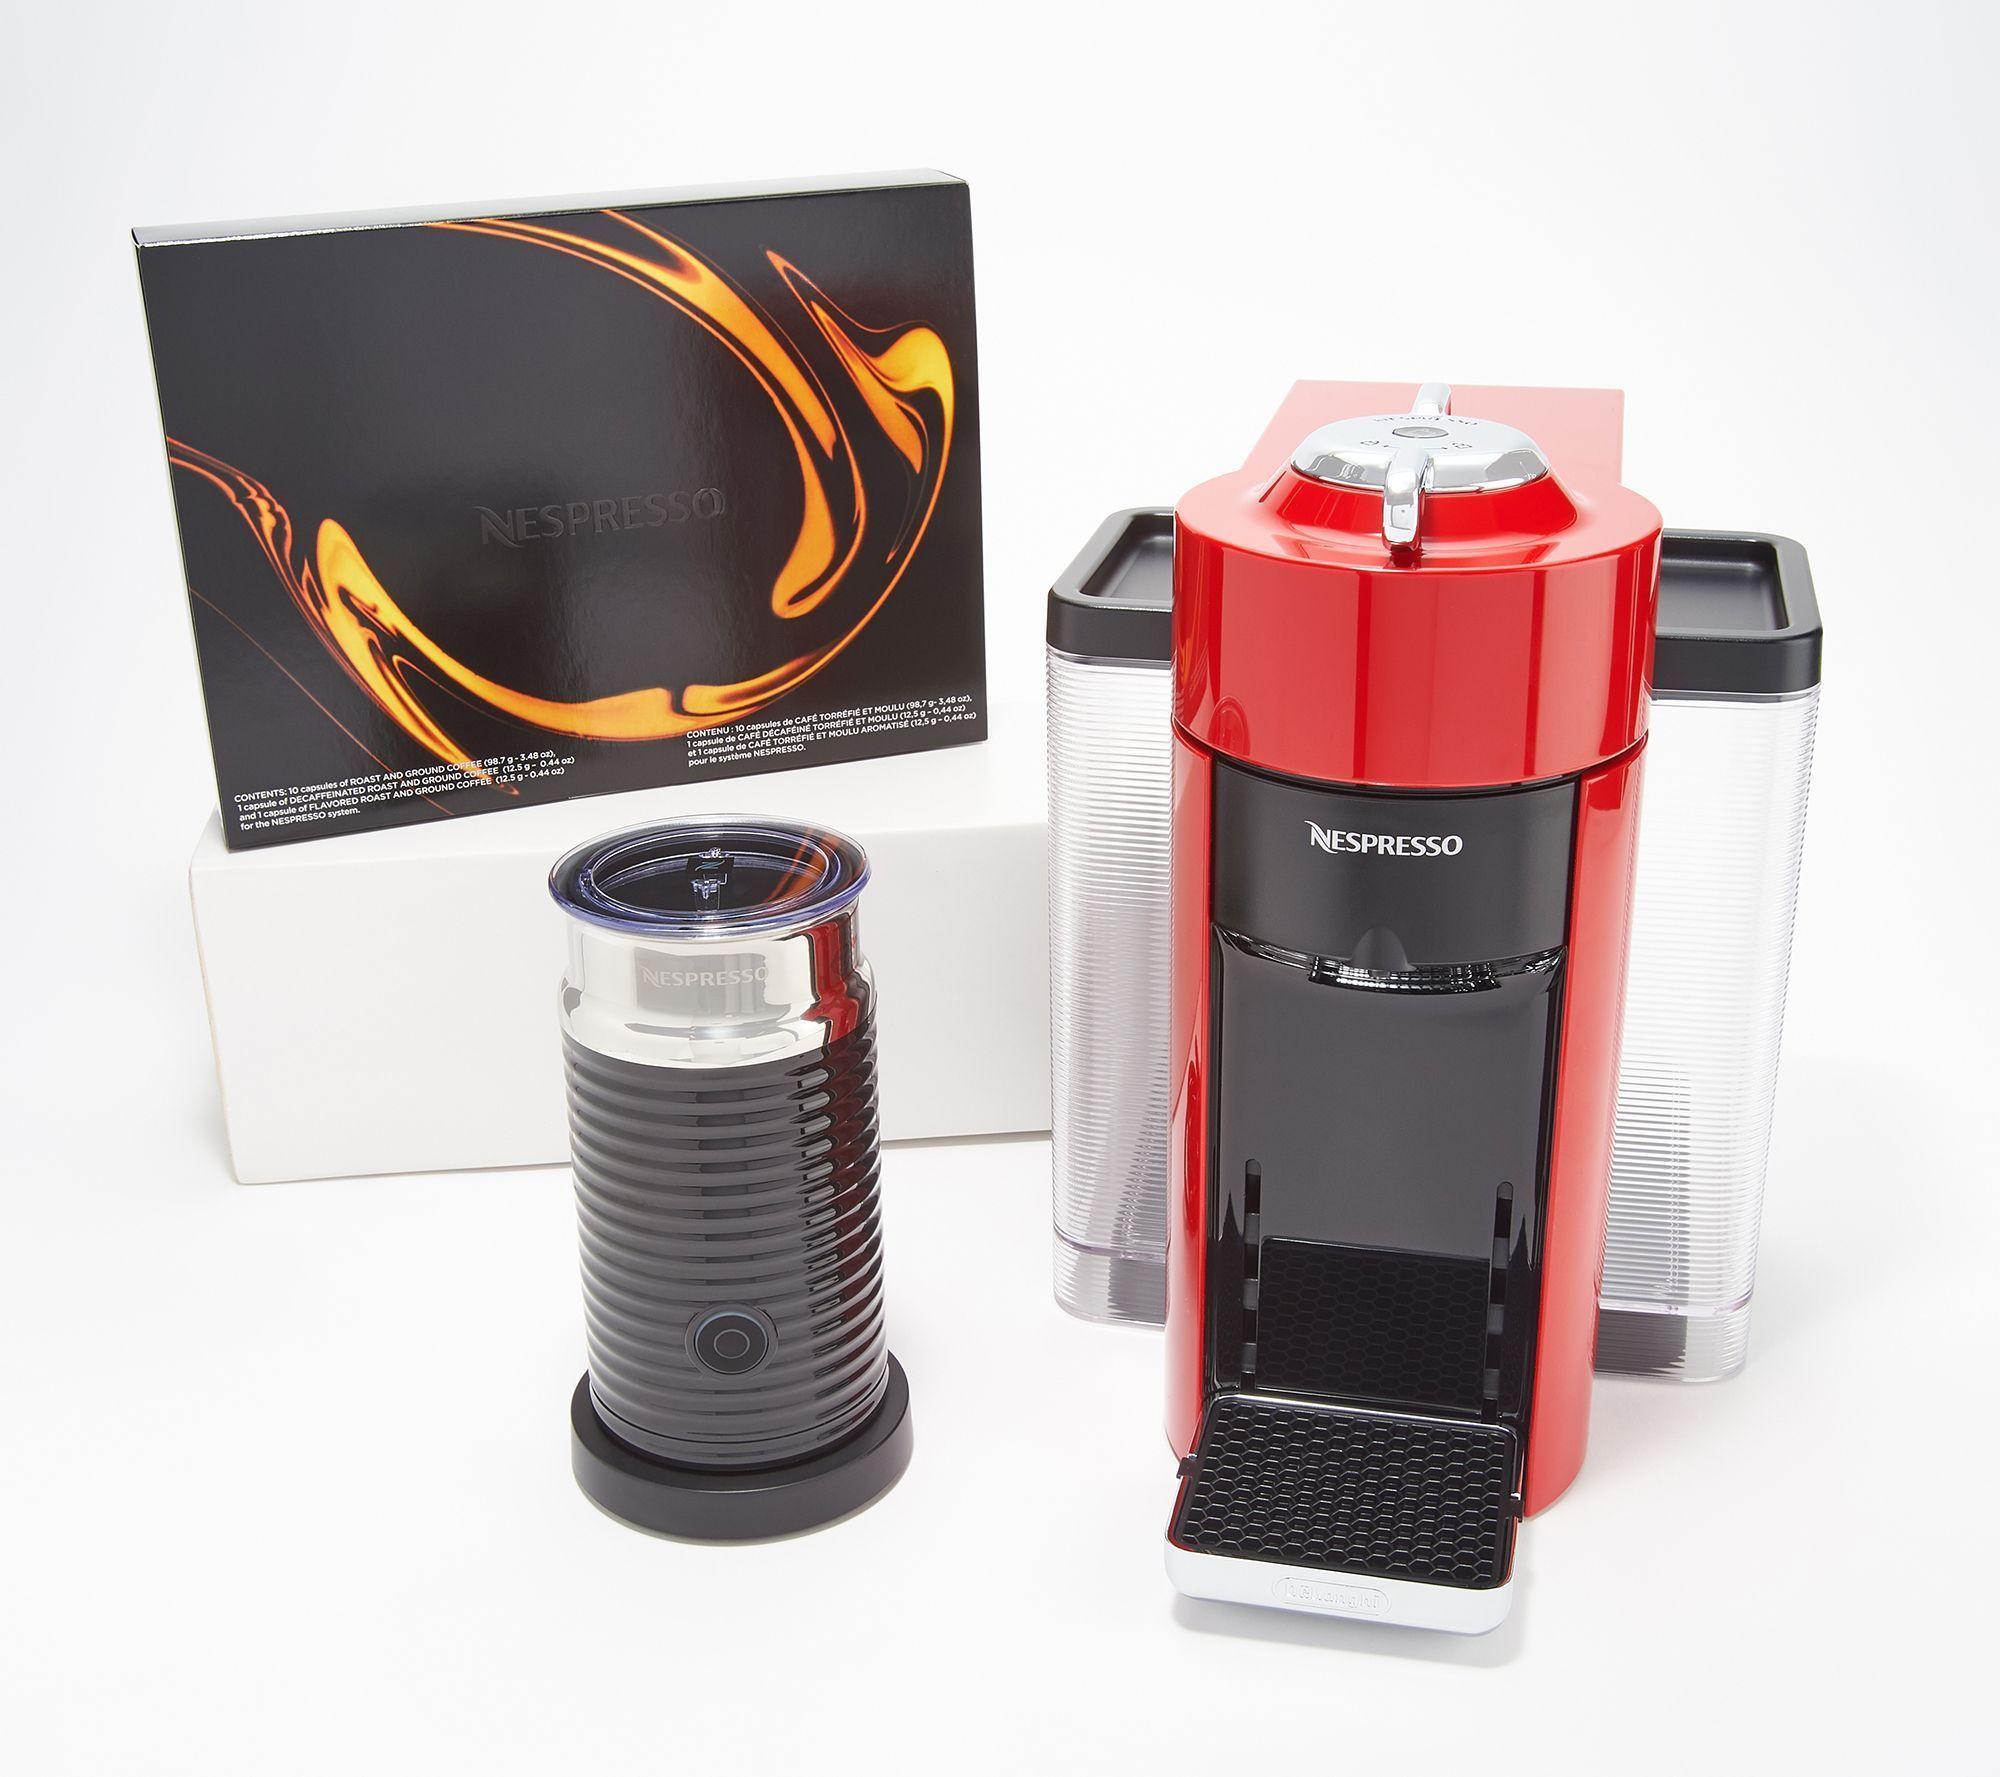 Nespresso Vertuo Coffee And Espresso Maker W Coupon Milk Frother Qvc Com Espressomaker Nespresso Vertuo Coffee And Espresso Maker Milk Frother Nespresso